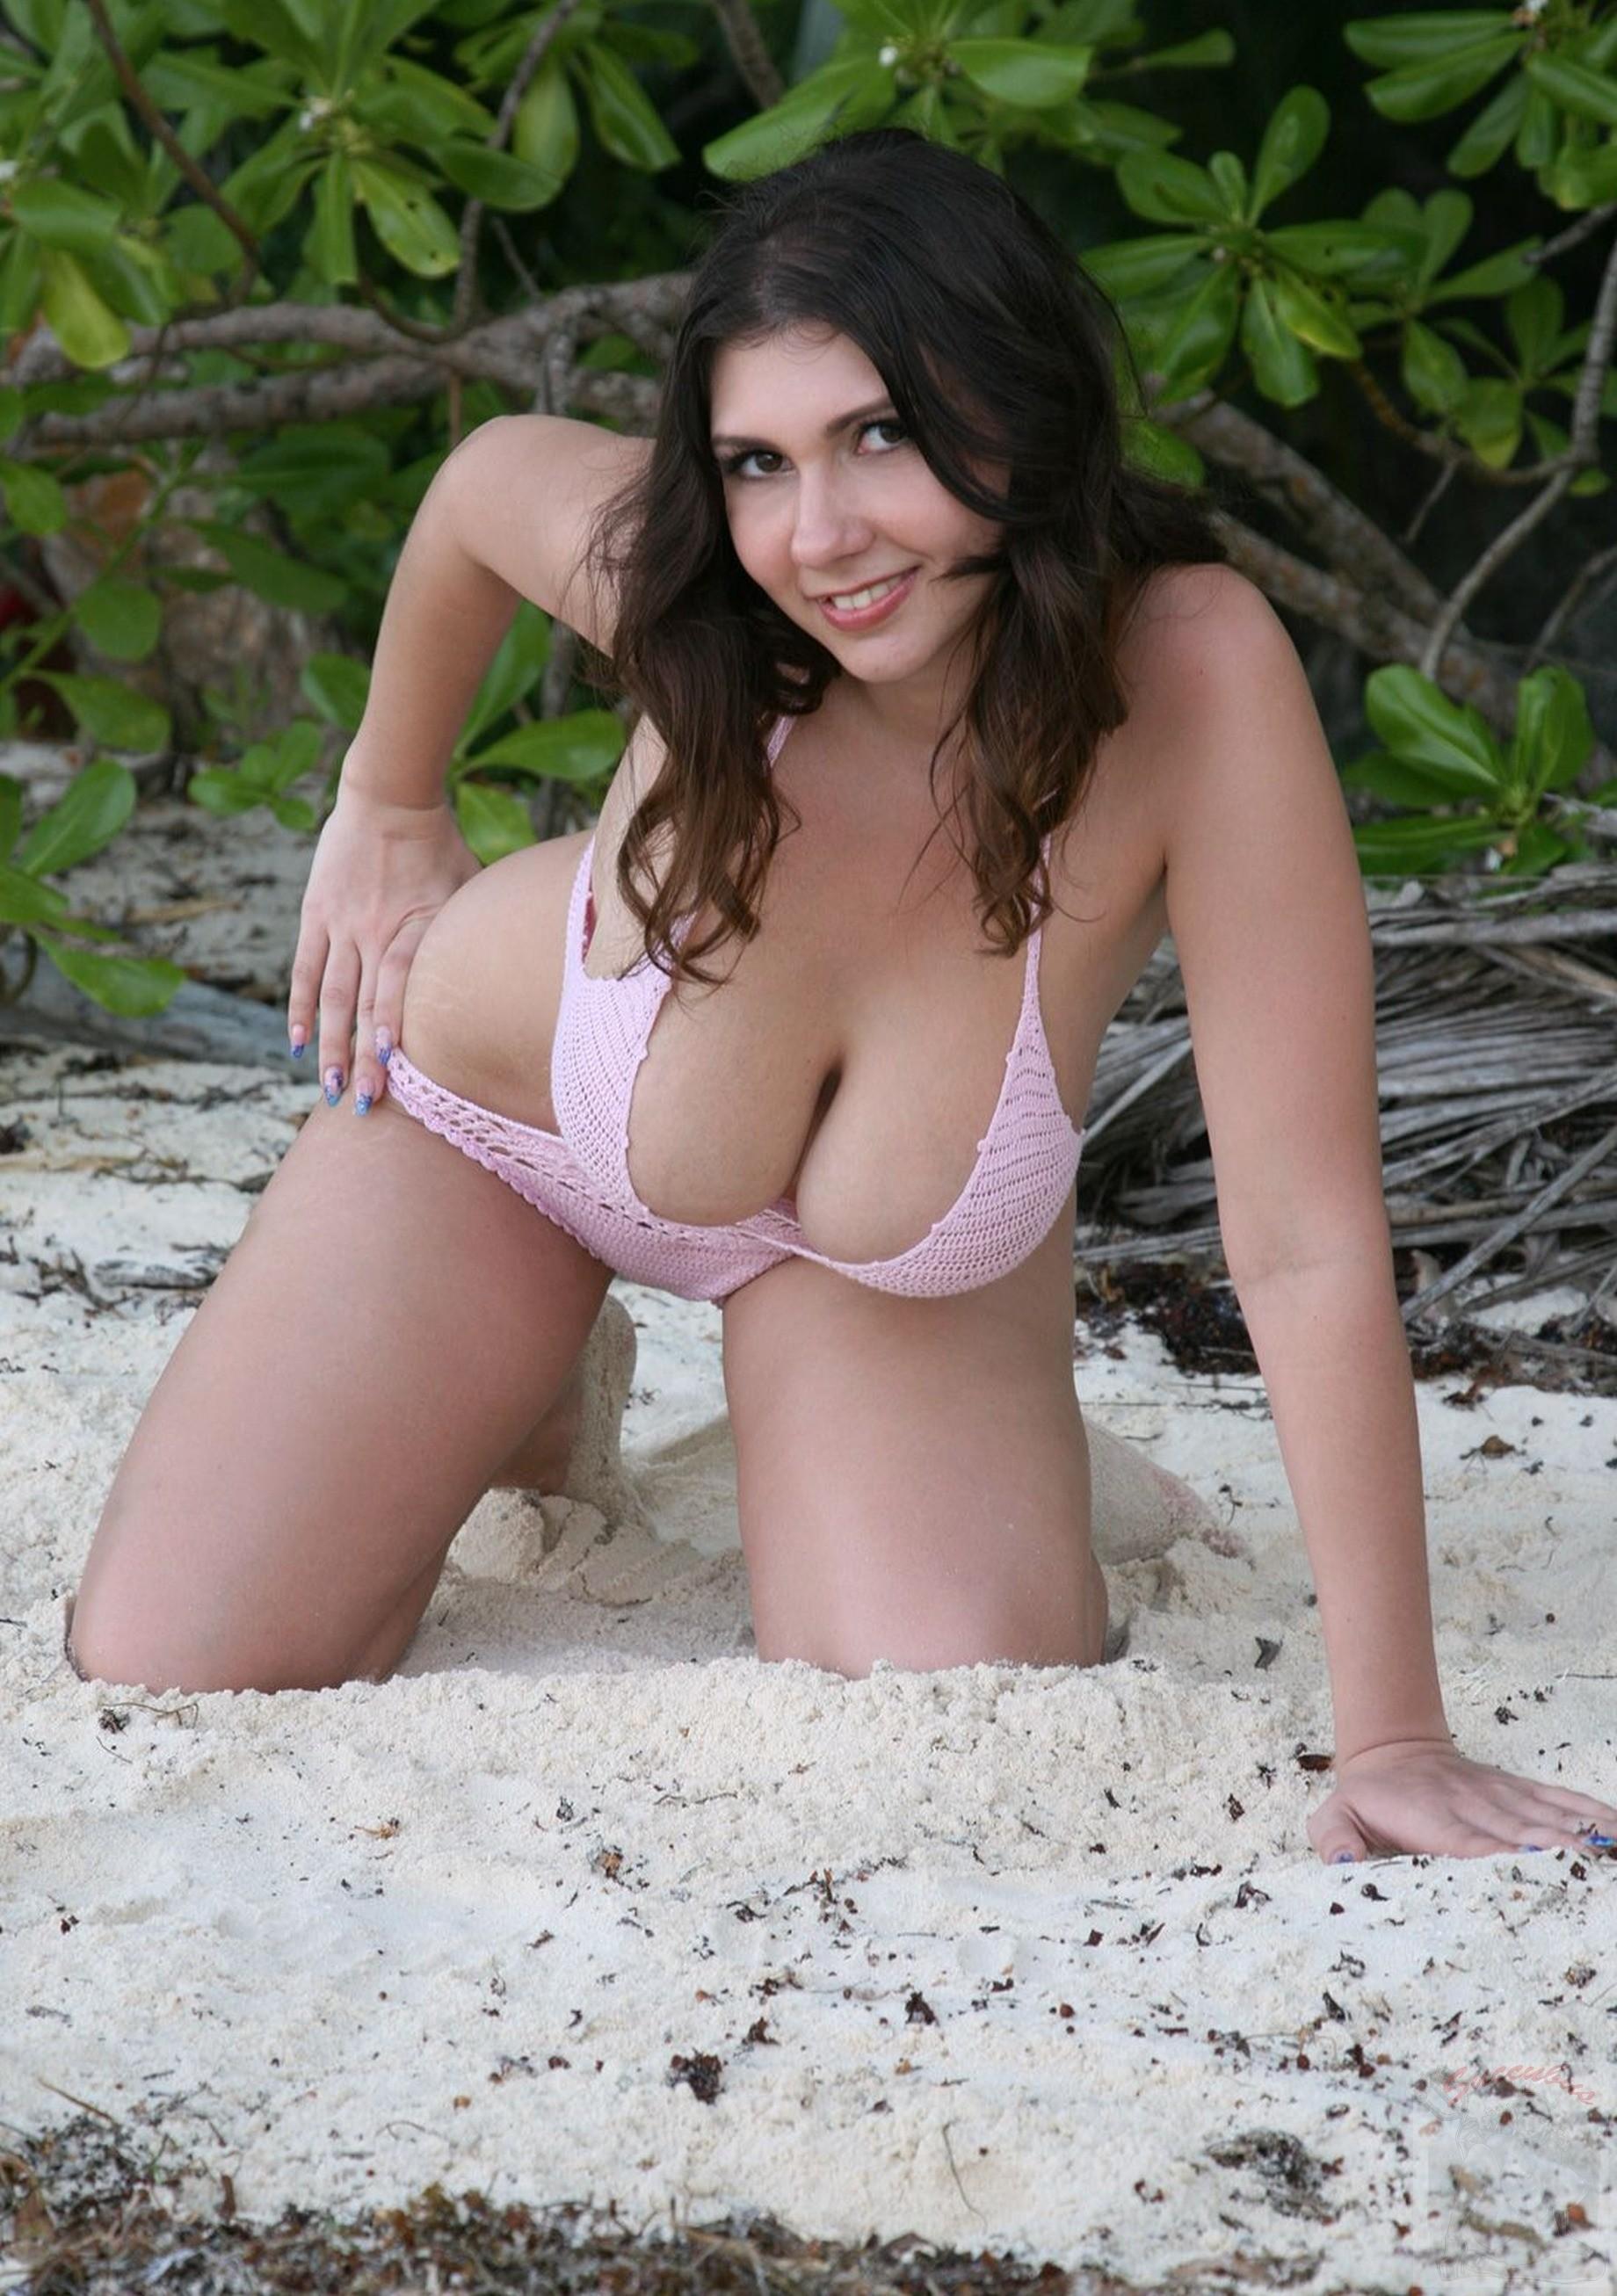 Трахнули девку на природе порно фото